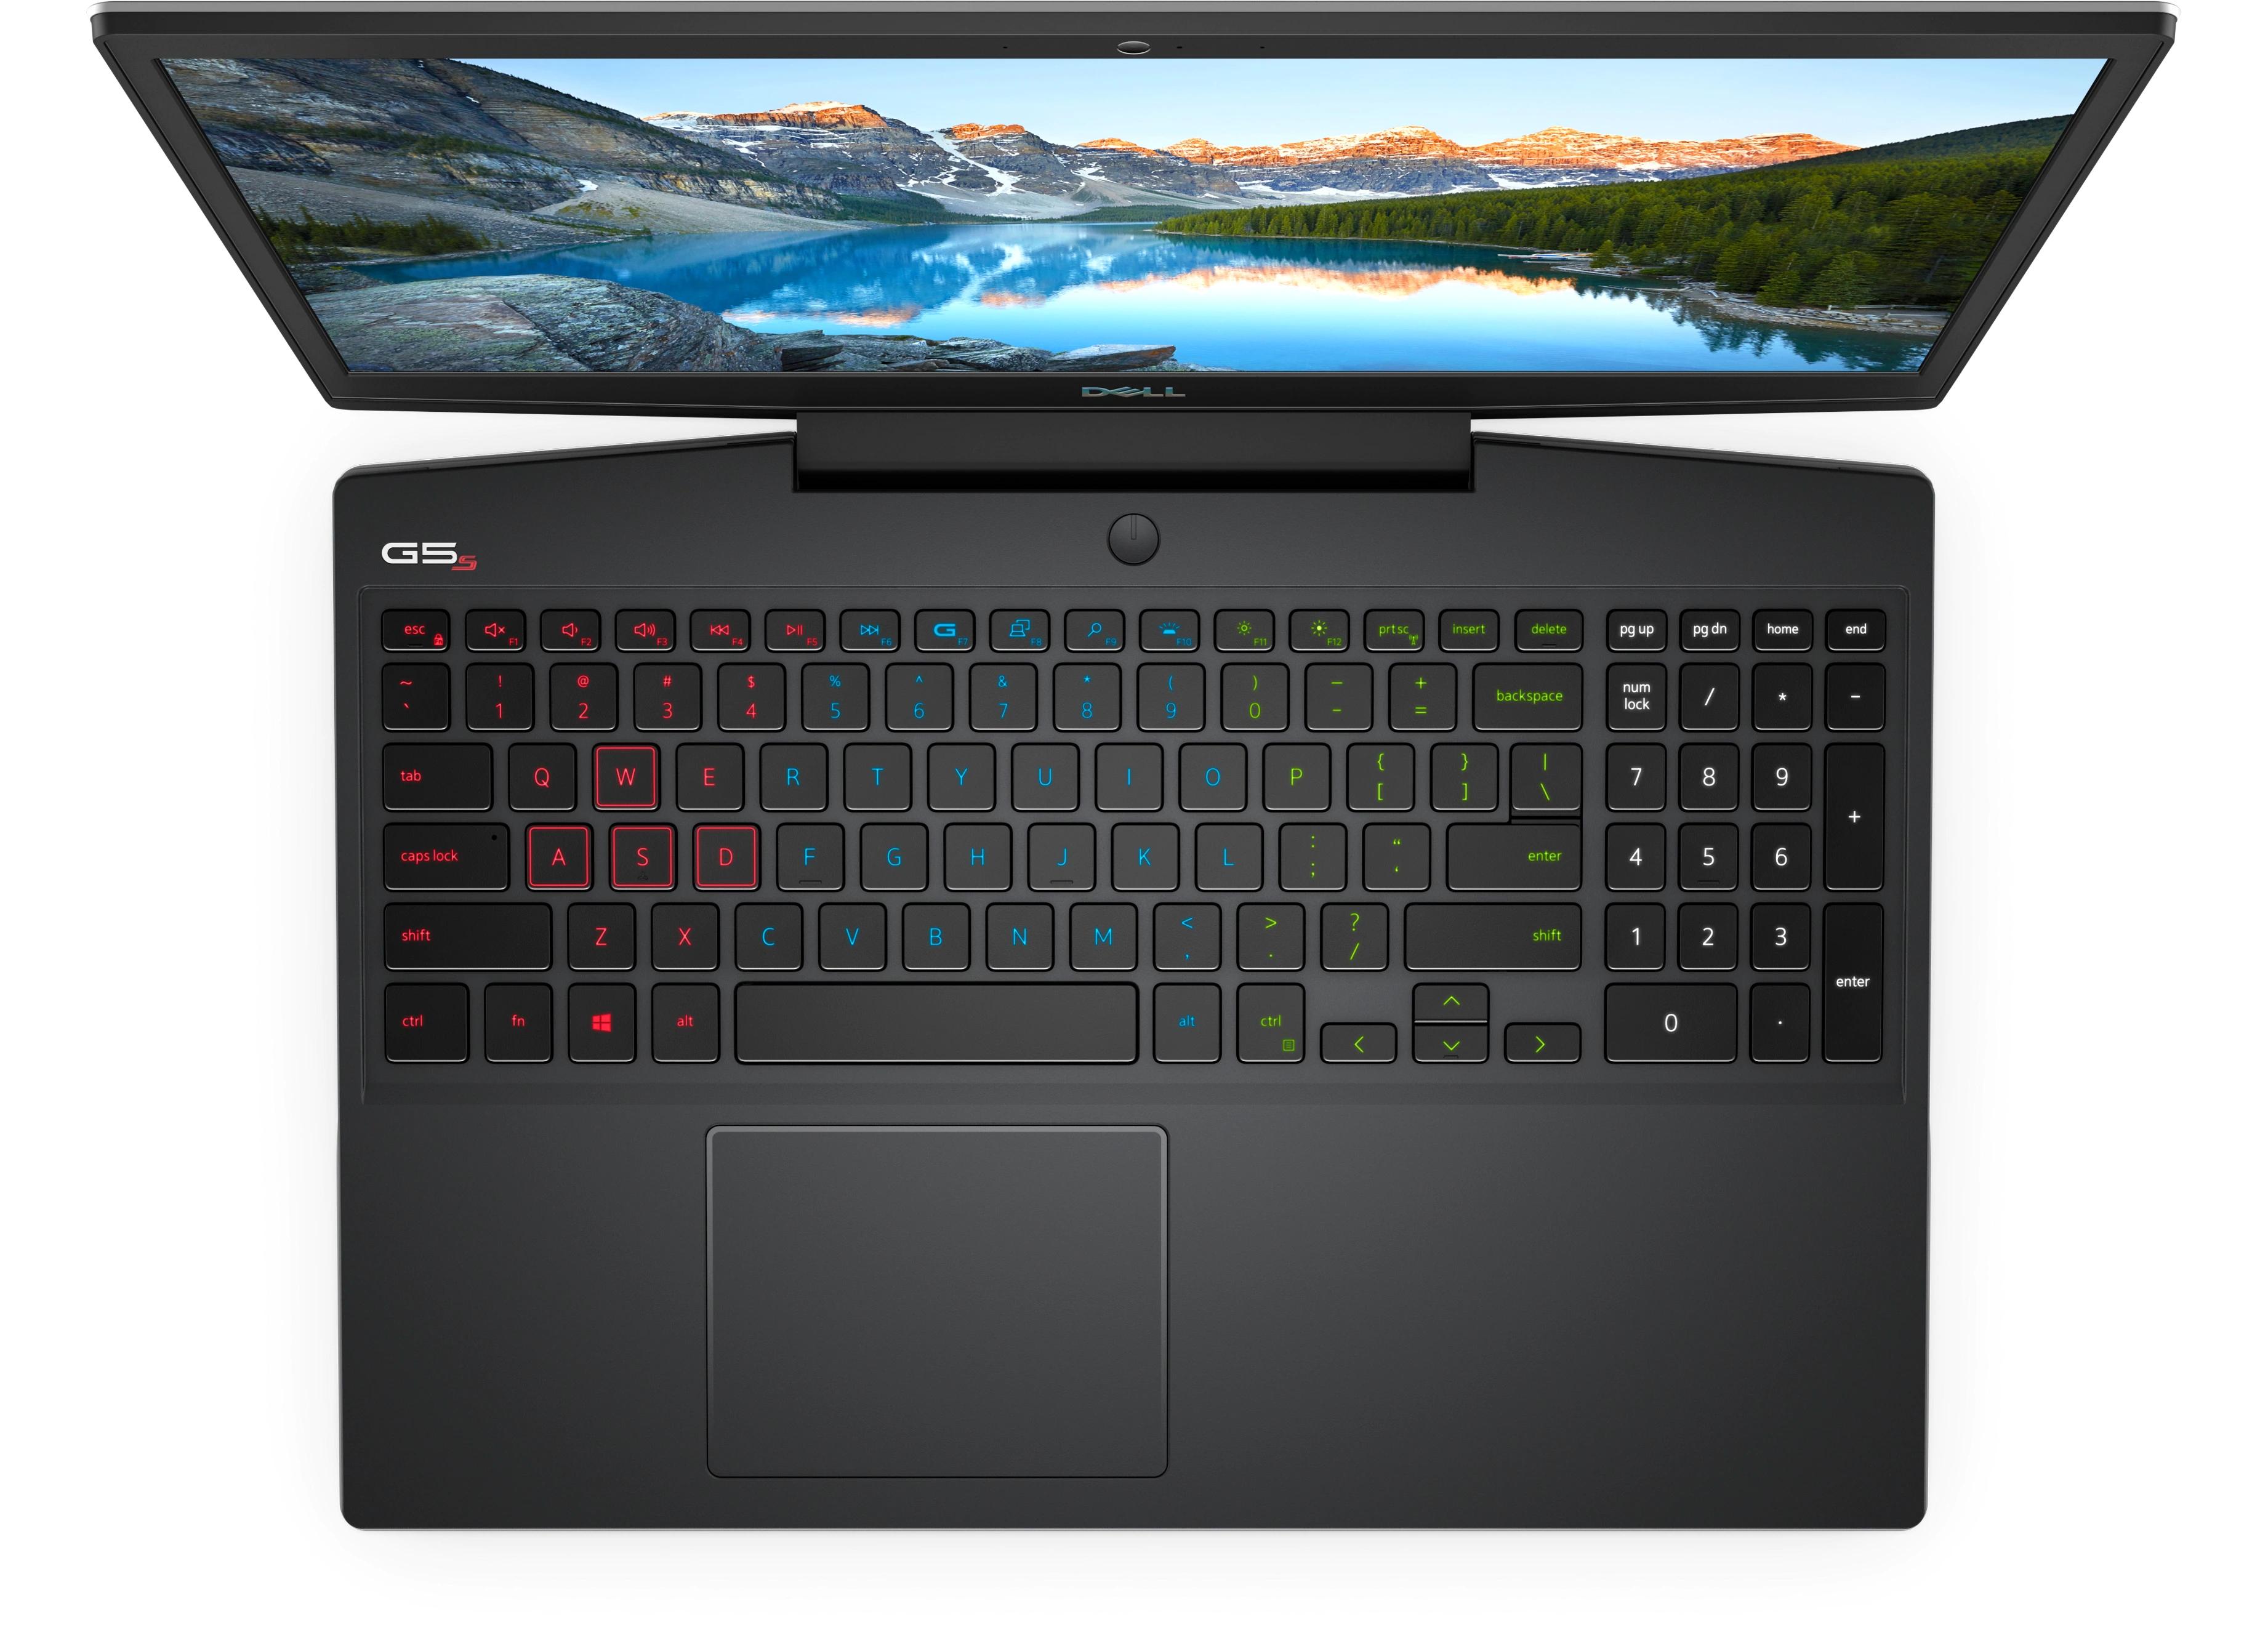 keyboard_dell_g5_se_5505_2021_laptopvang.